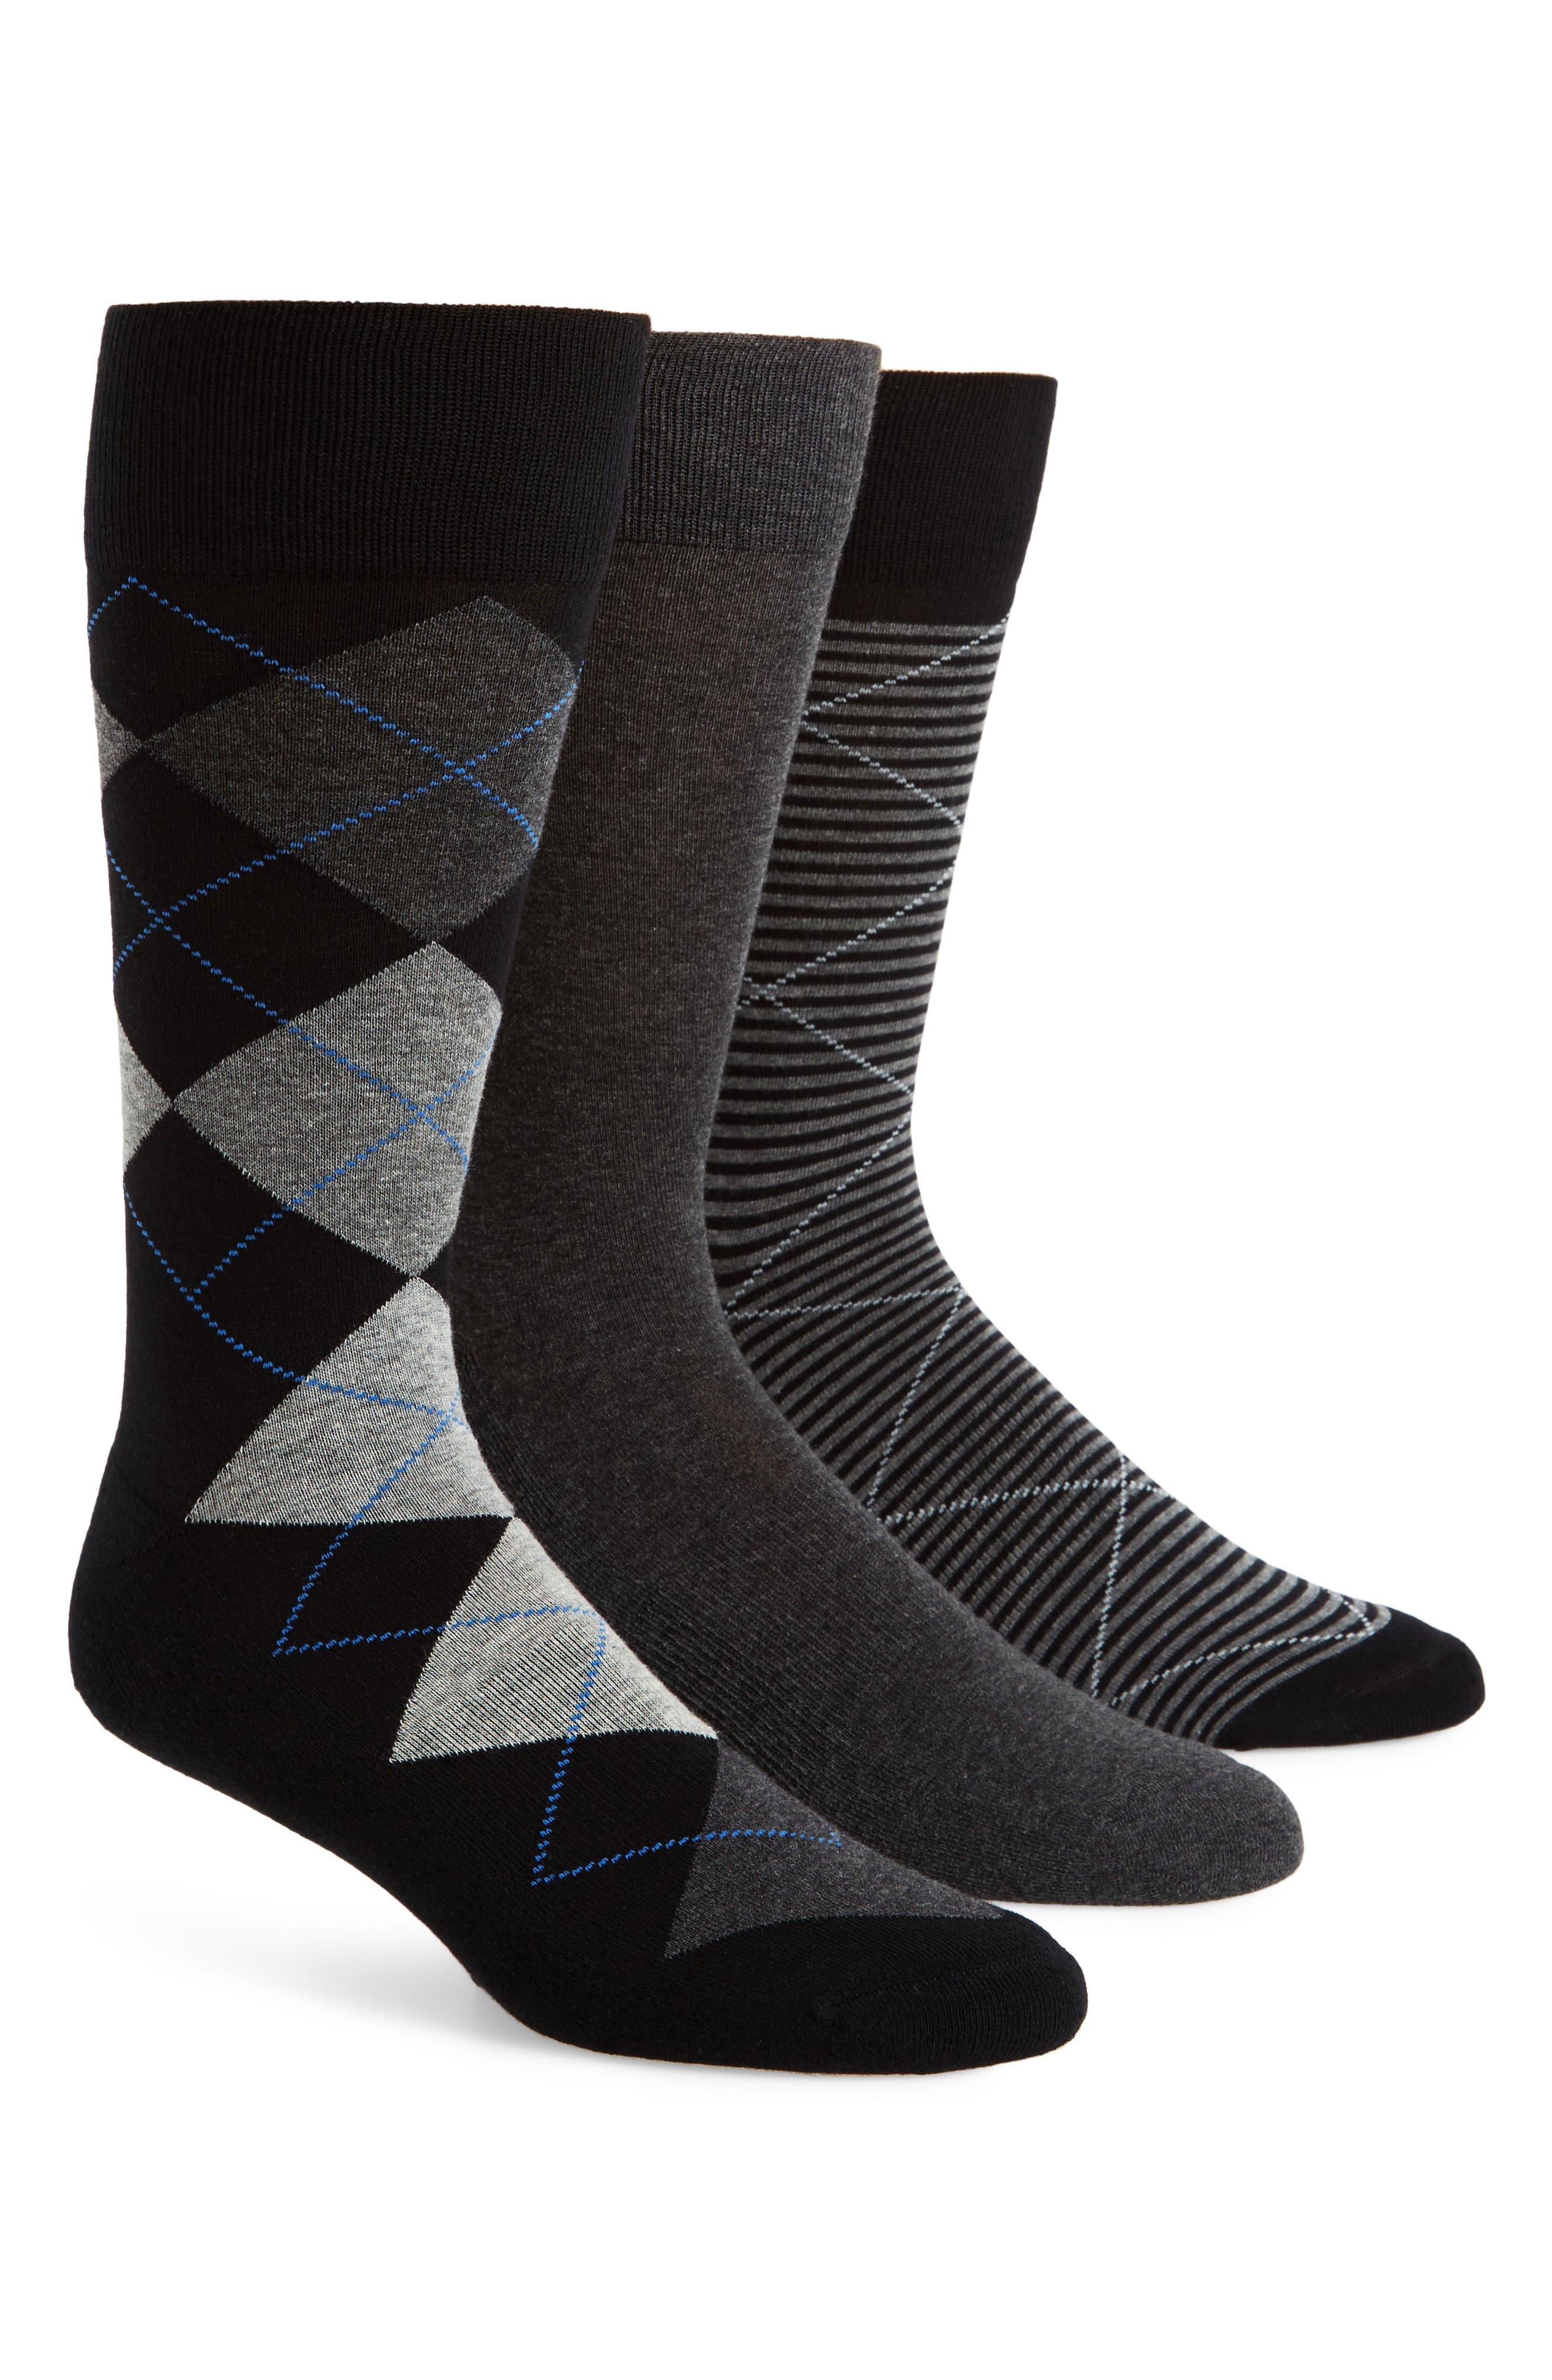 3-Pack Cotton Blend Socks,                             Main thumbnail 1, color,                             021